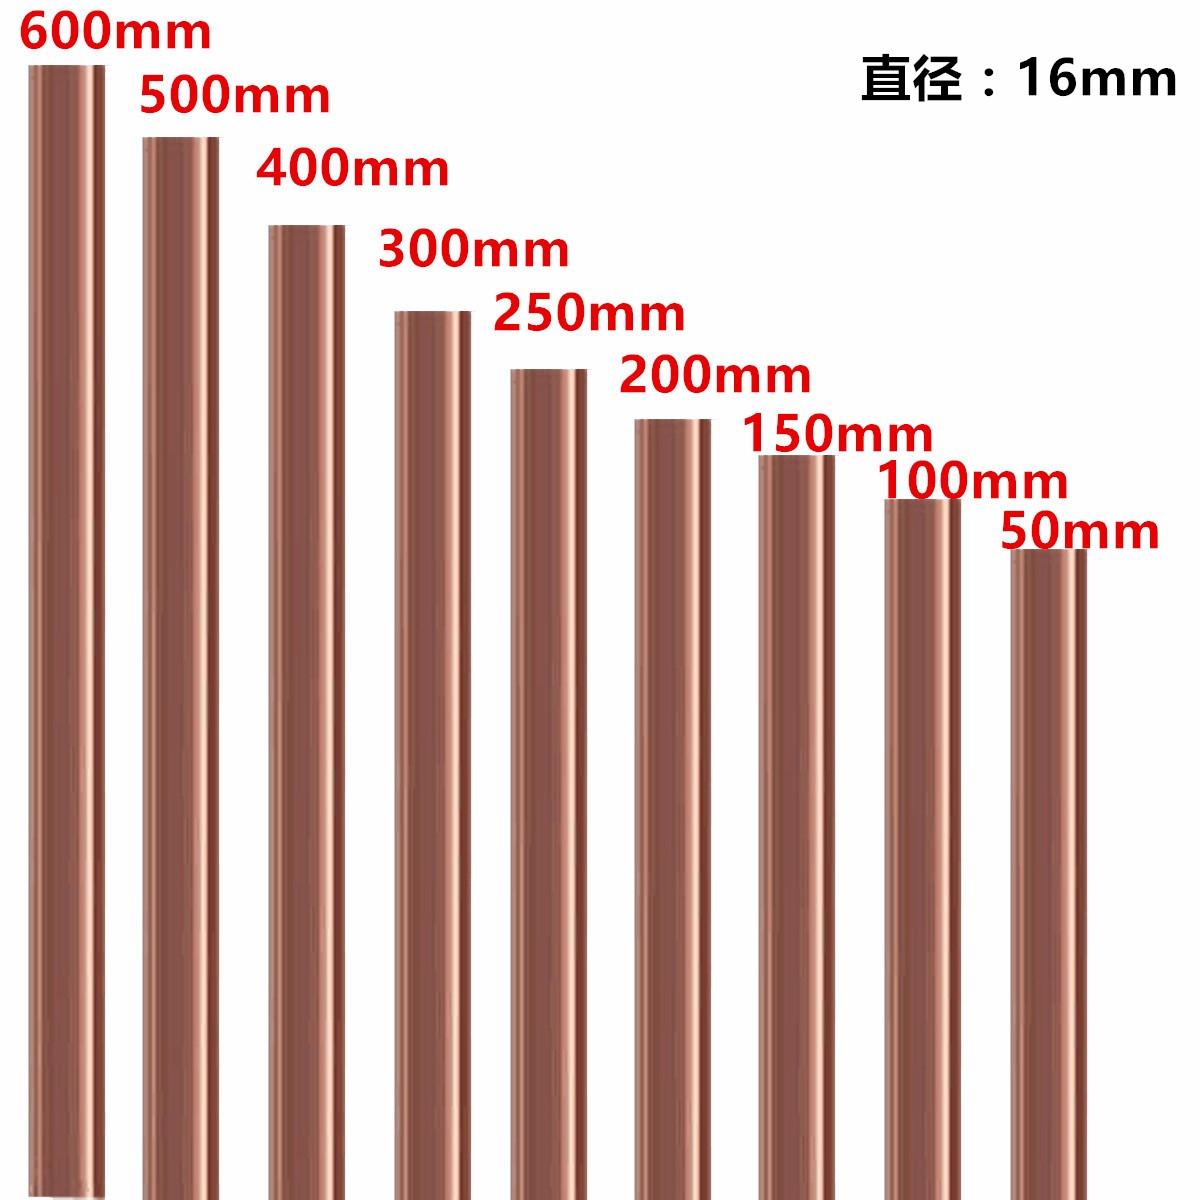 150mm Copper Round Bar Rod 3mm 25mm Diameter Milling  : 790c853e 7e1a 18b9 4e40 471501587e31 from www.lazada.sg size 1200 x 1200 jpeg 235kB